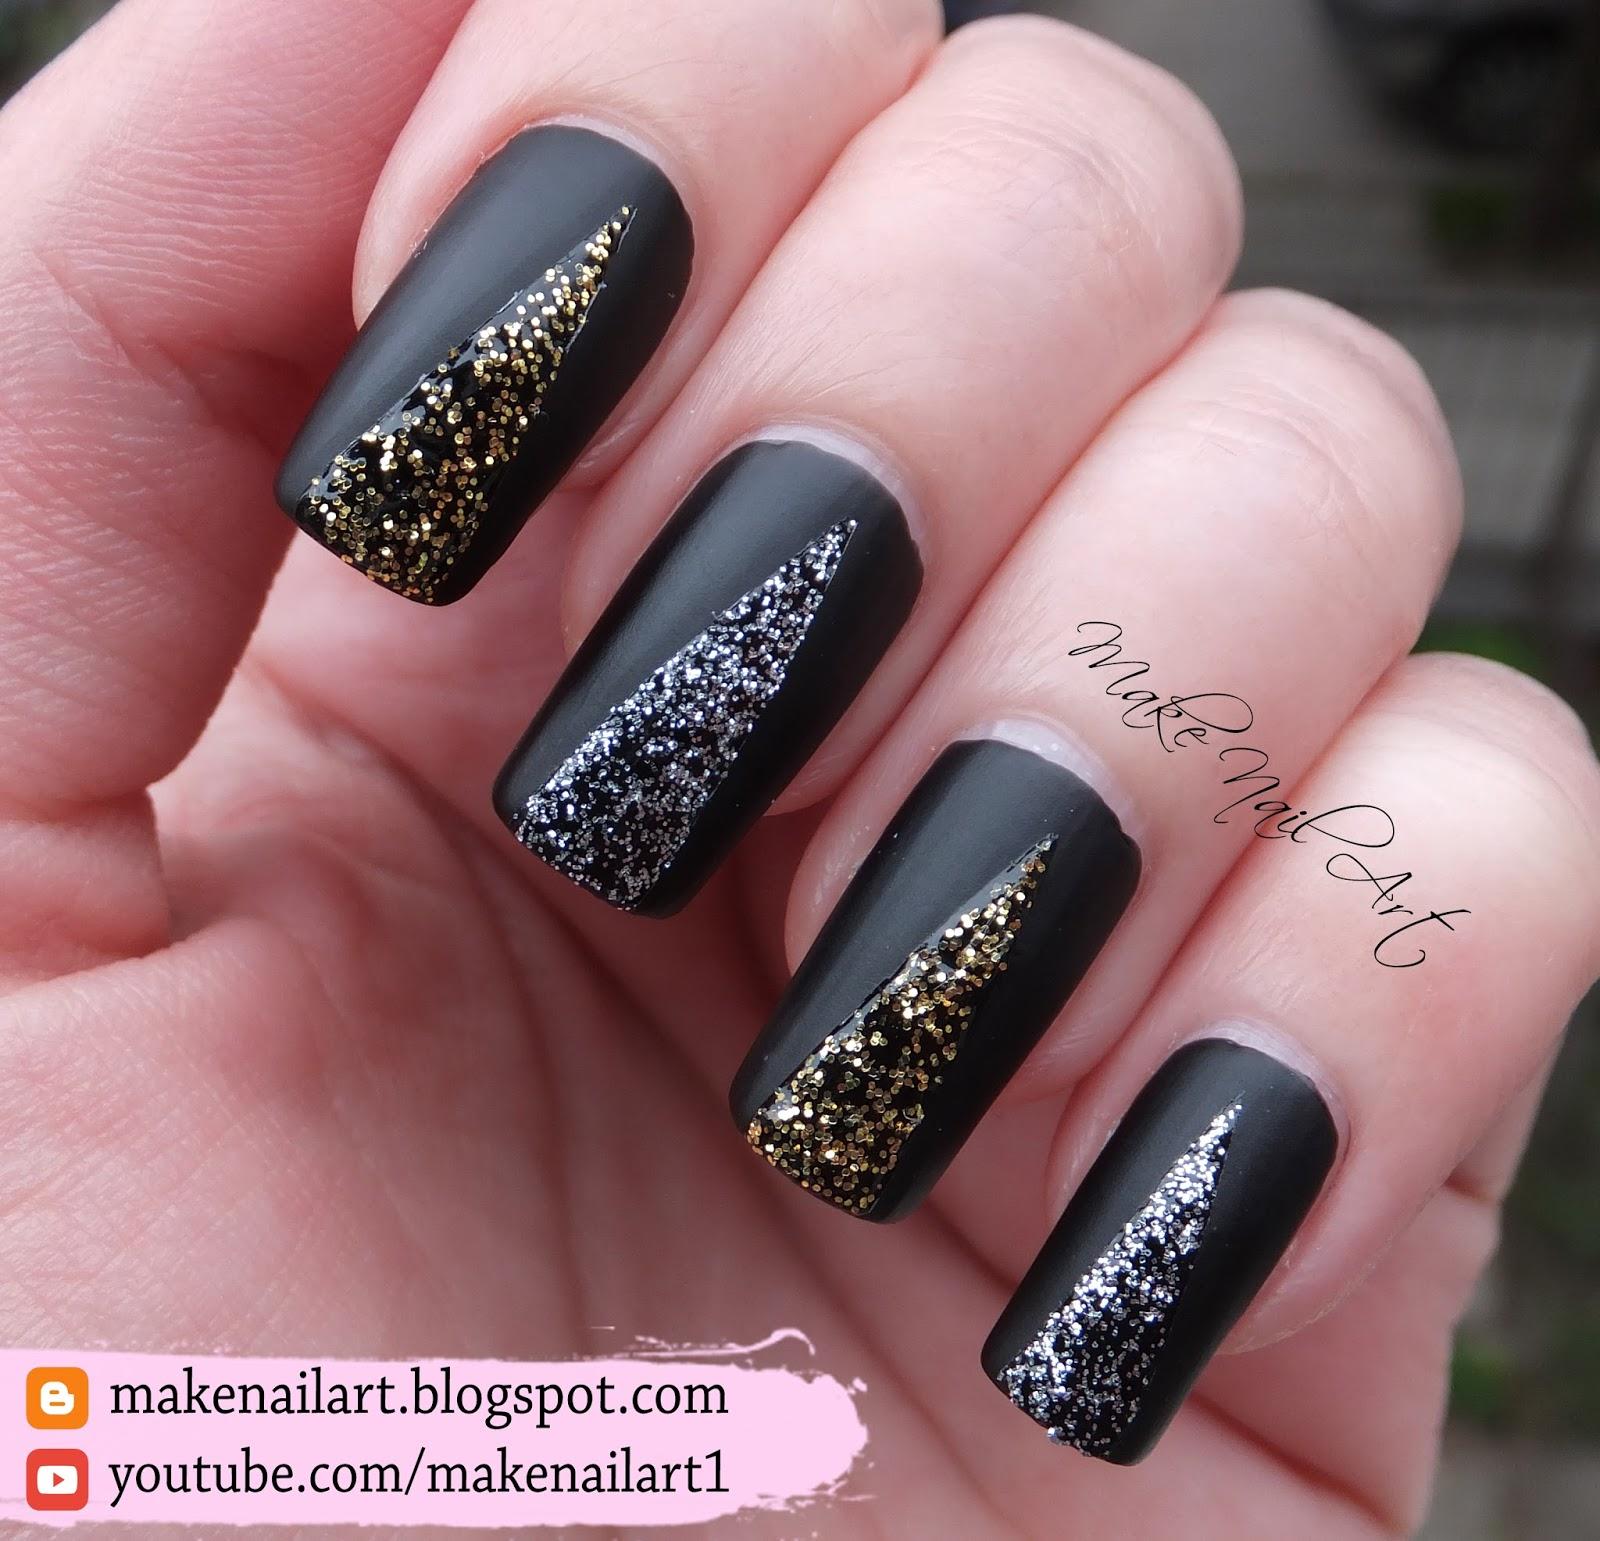 Make Nail Art: Easy Prom Nails - Black Matte With Glitter ...